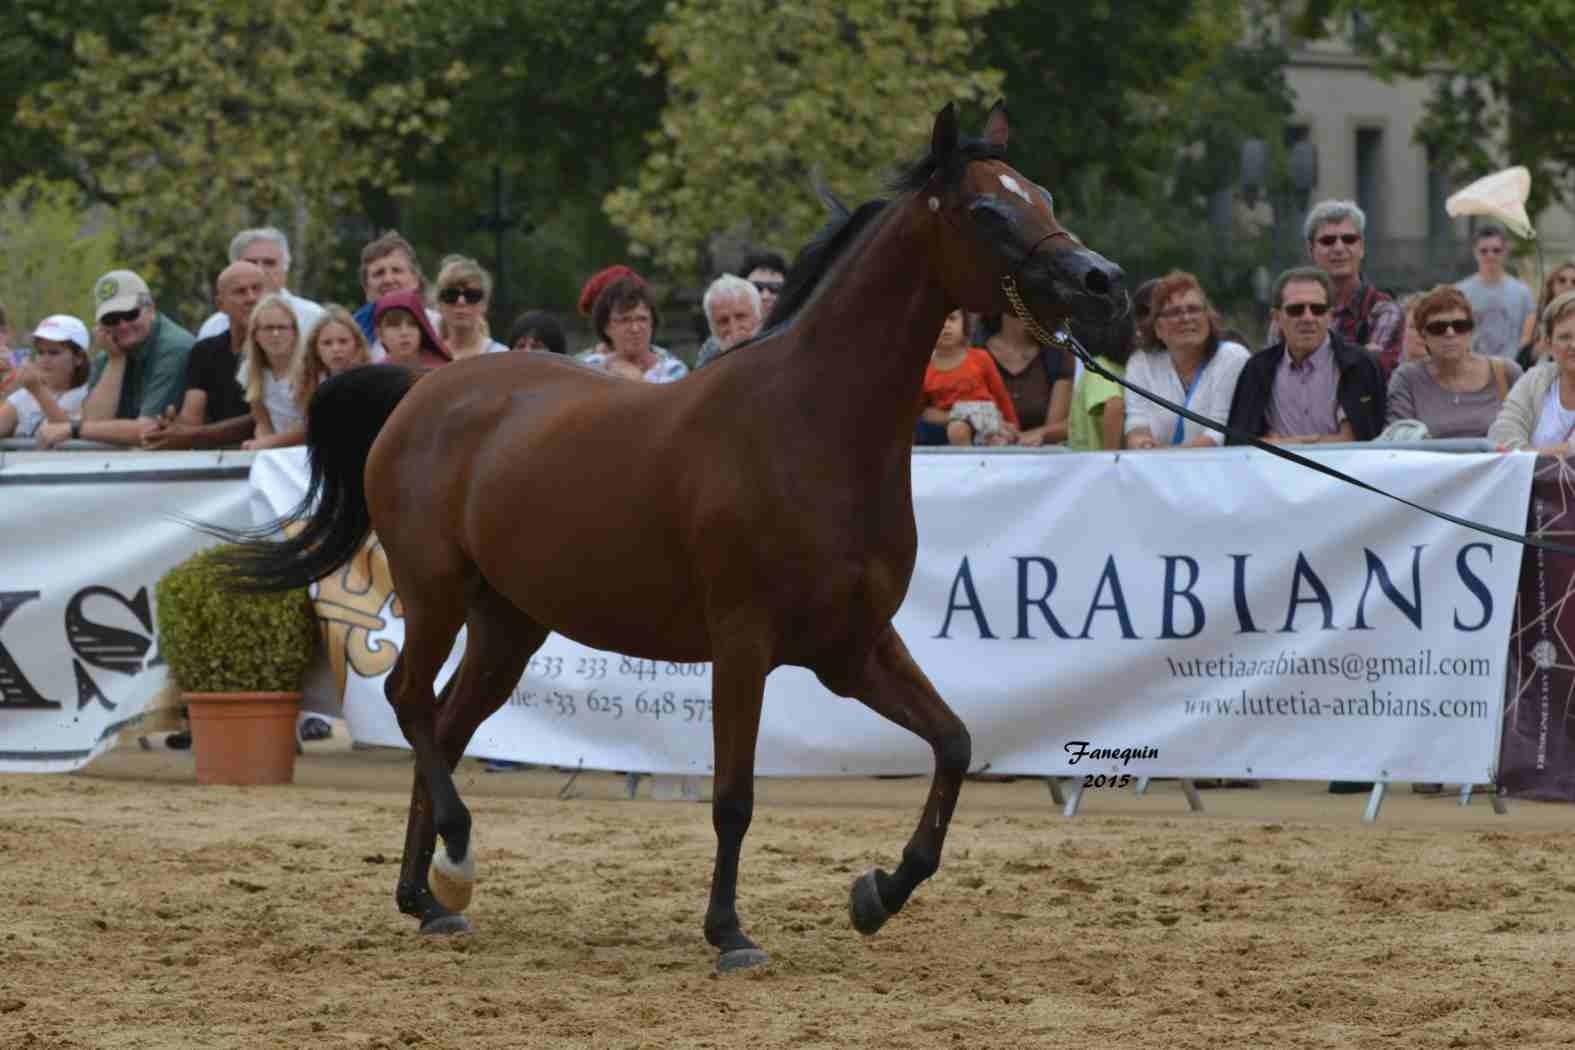 KARAWAN ALBIDAYER en 2015 - Concours national Nîmes prestige - notre sélection - 14